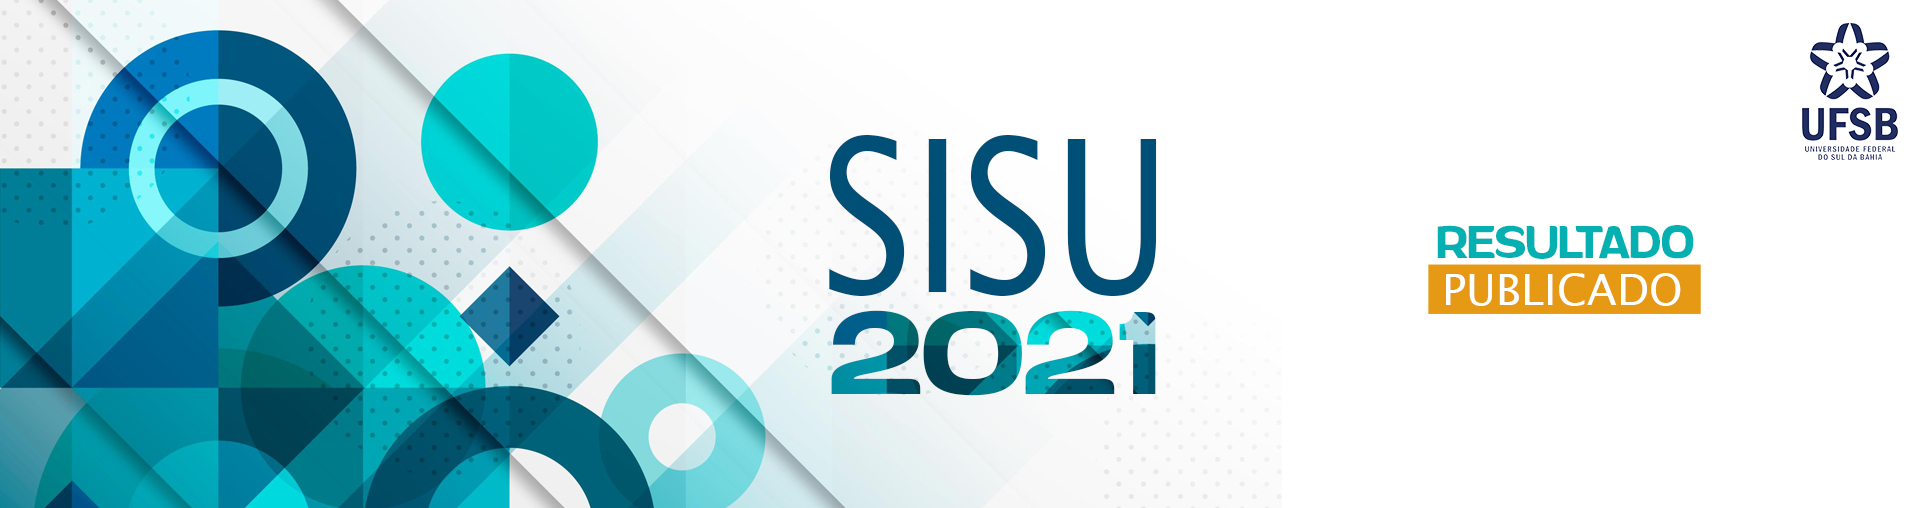 Processo Seletivo UFSB SISU 2021